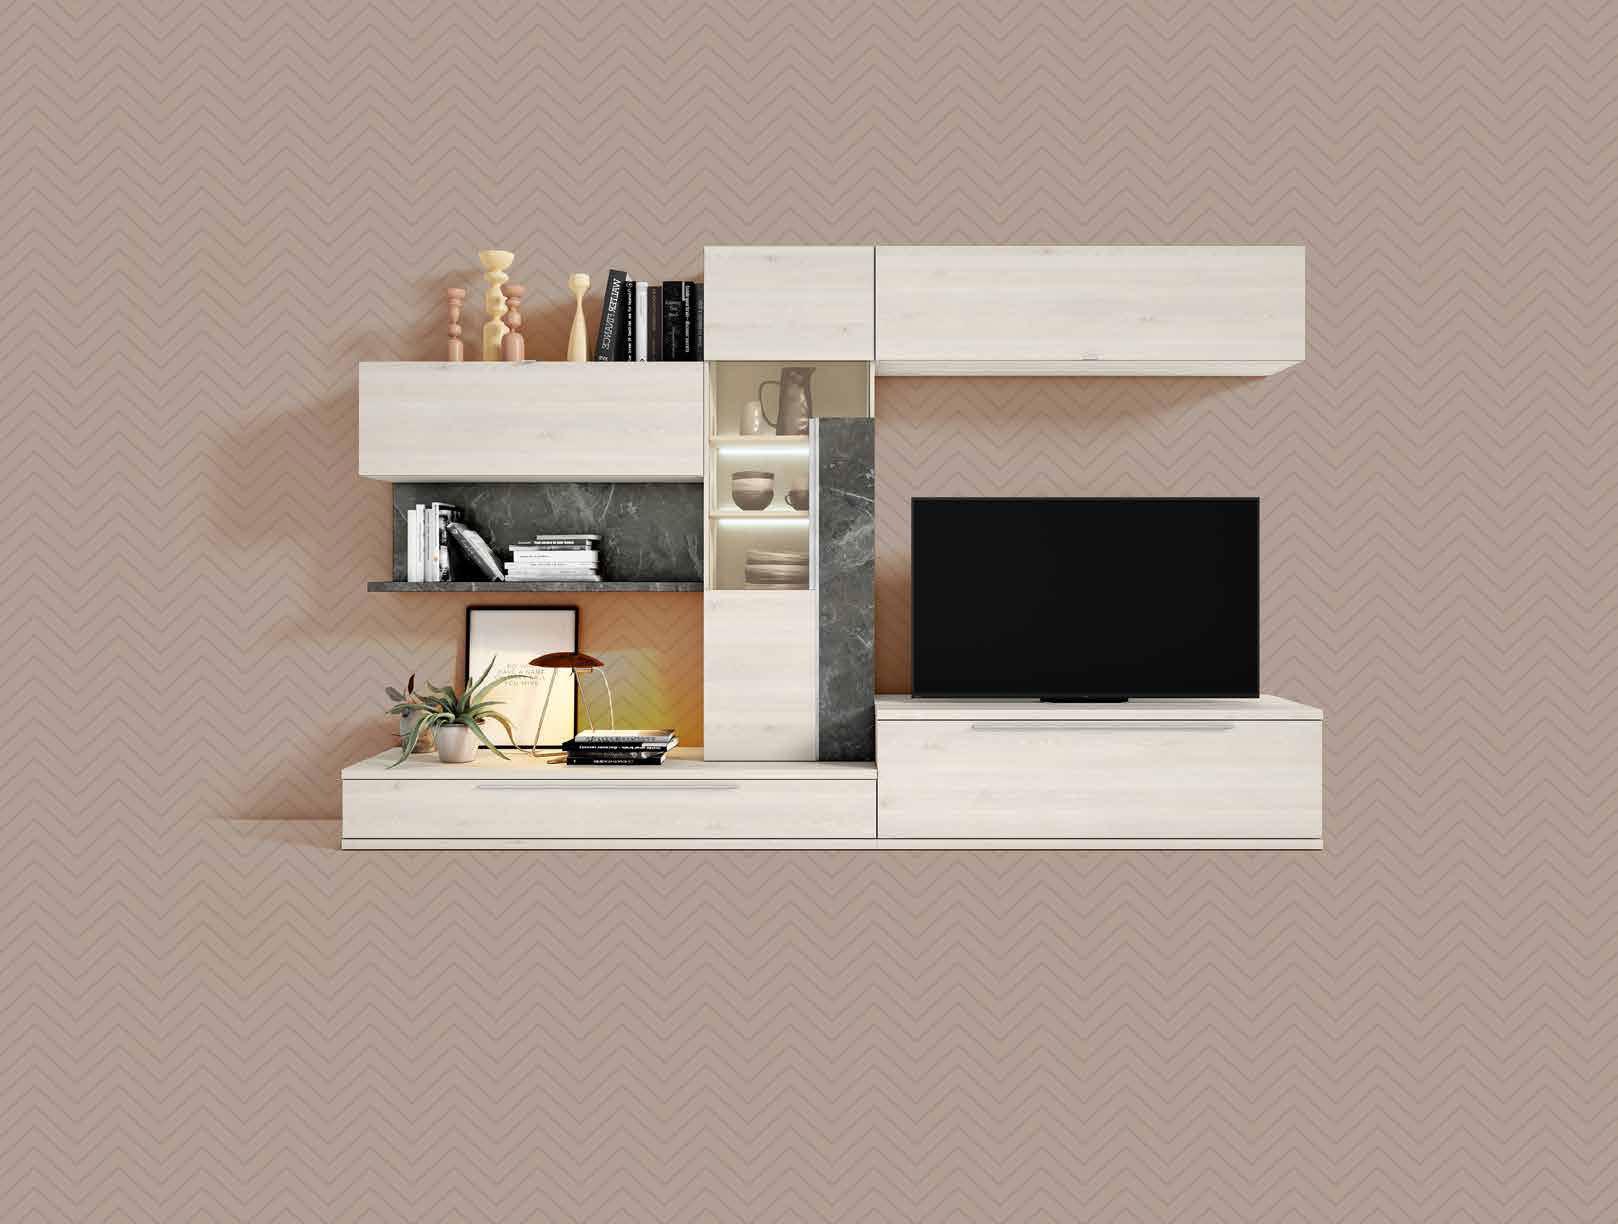 cubika-salon-036